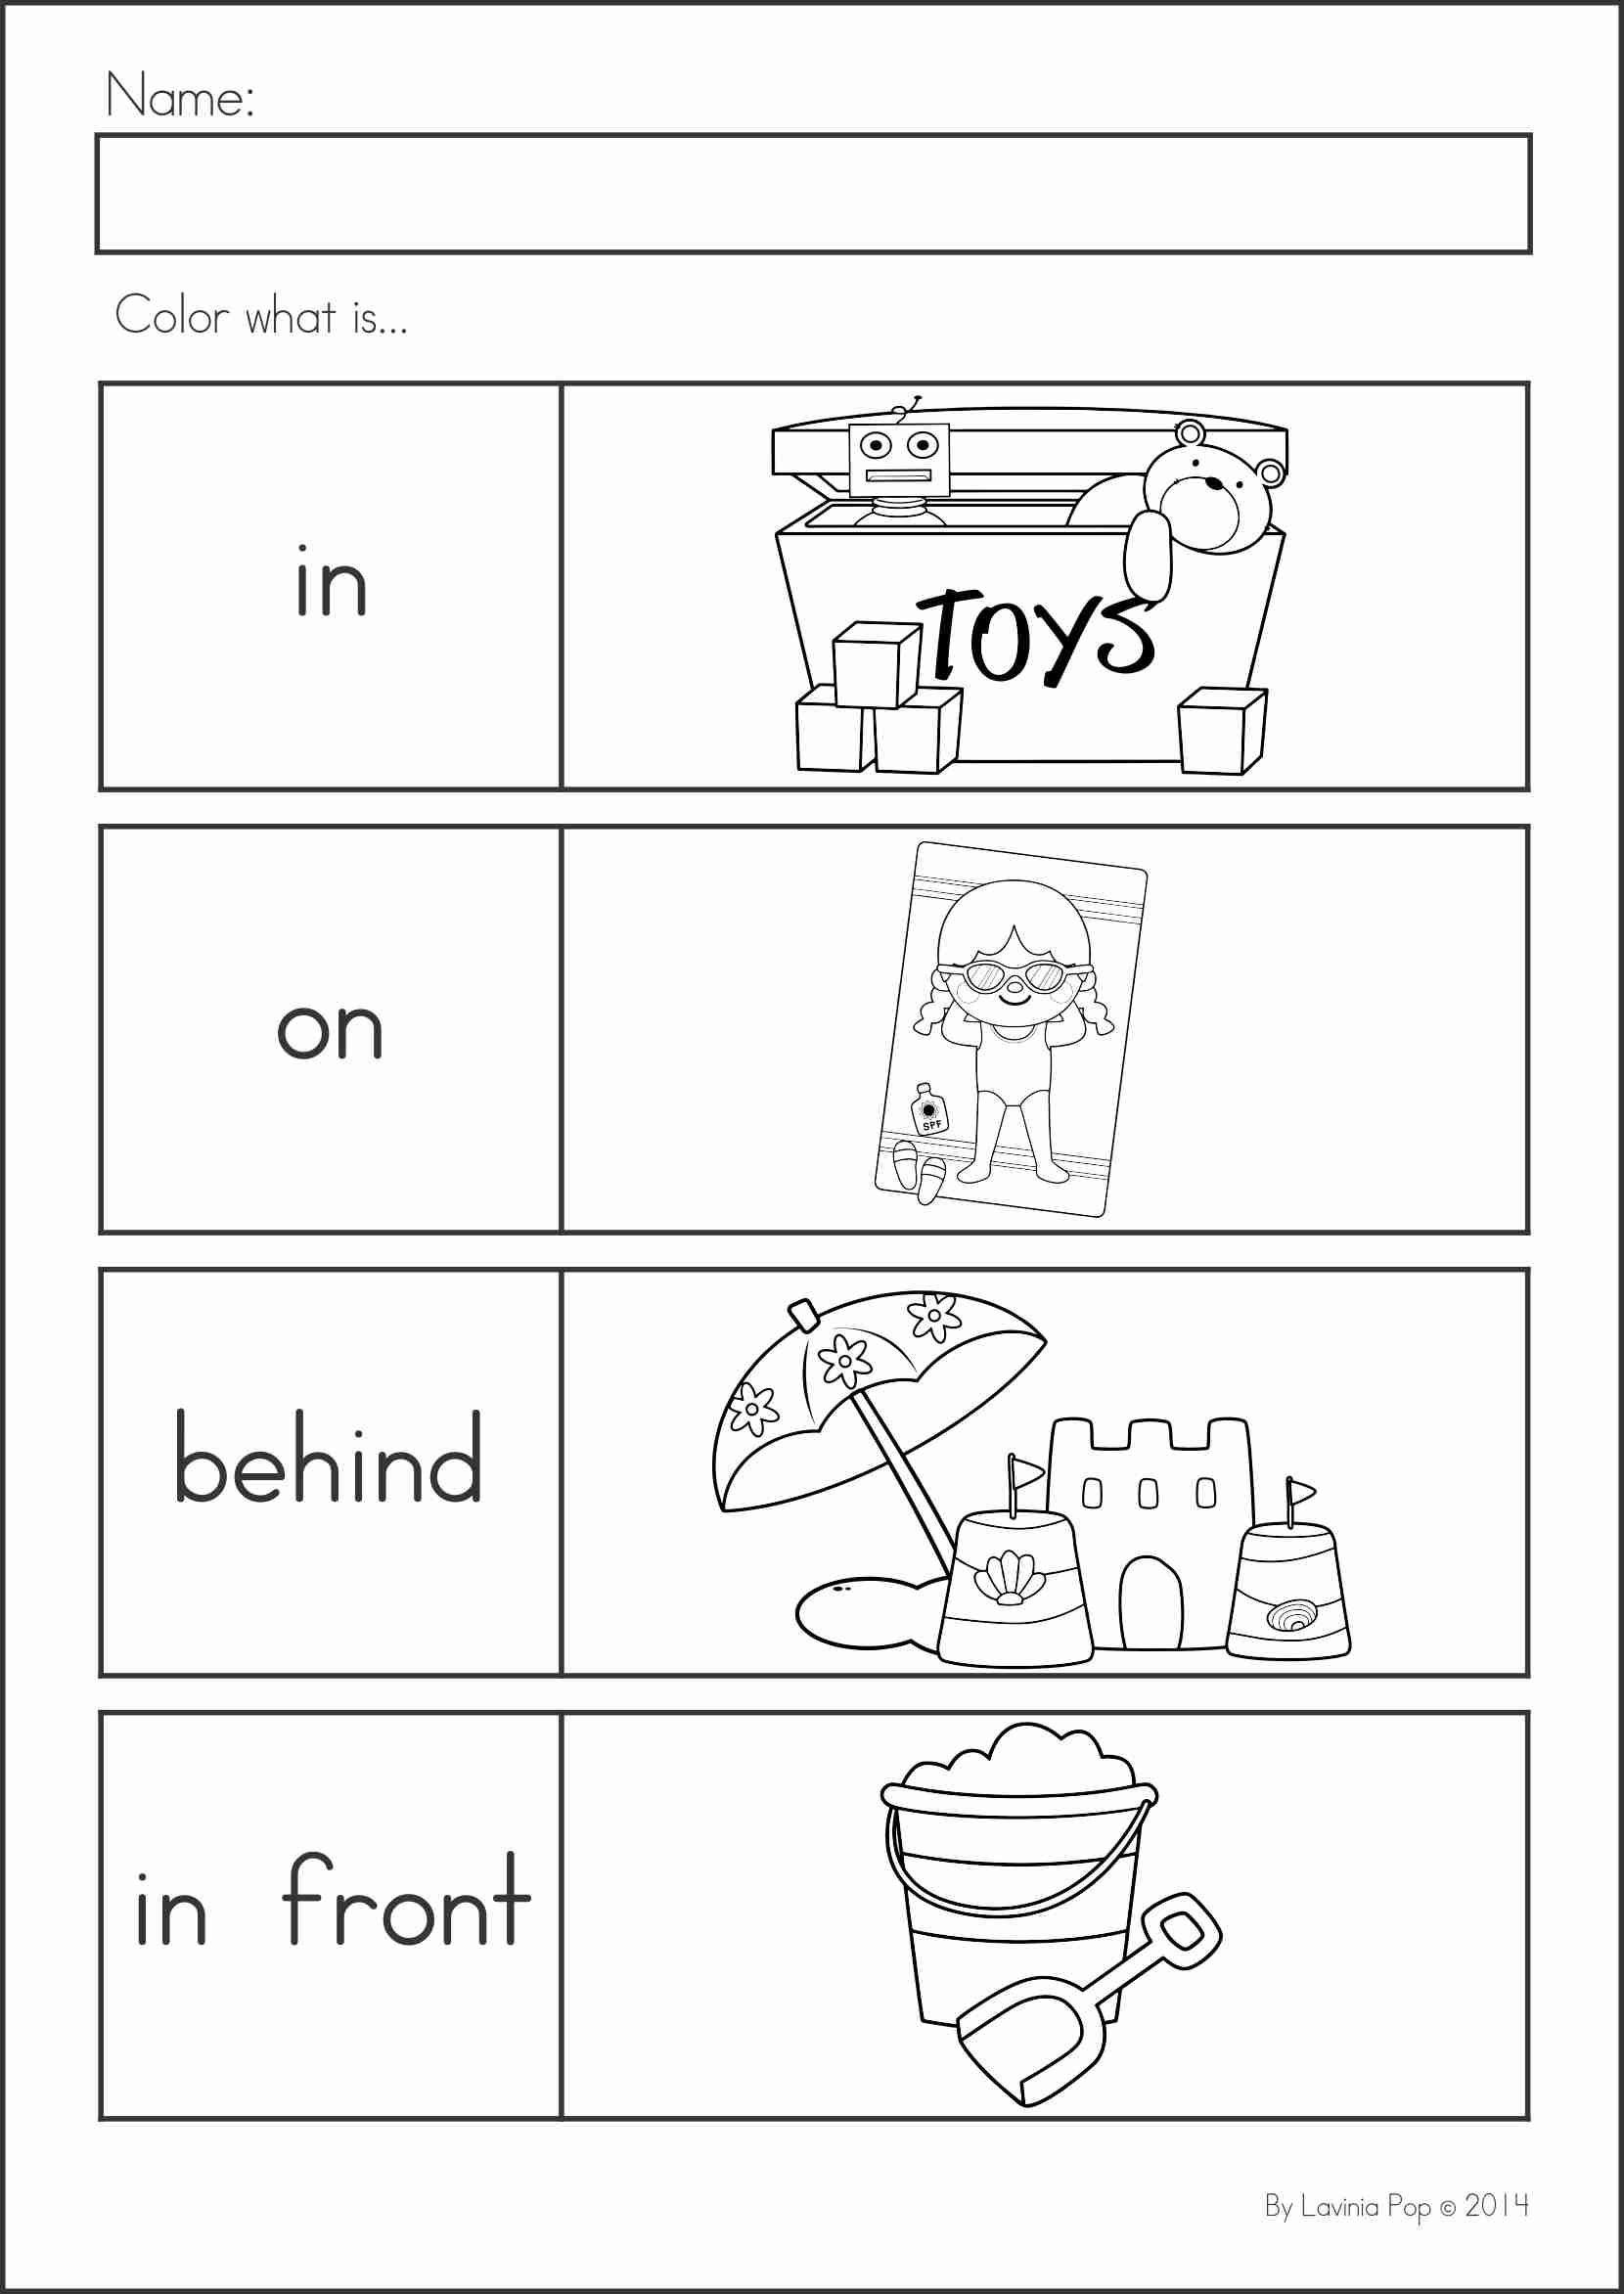 Positional Words Worksheet for Kindergarten Summer Review Kindergarten Math & Literacy Worksheets